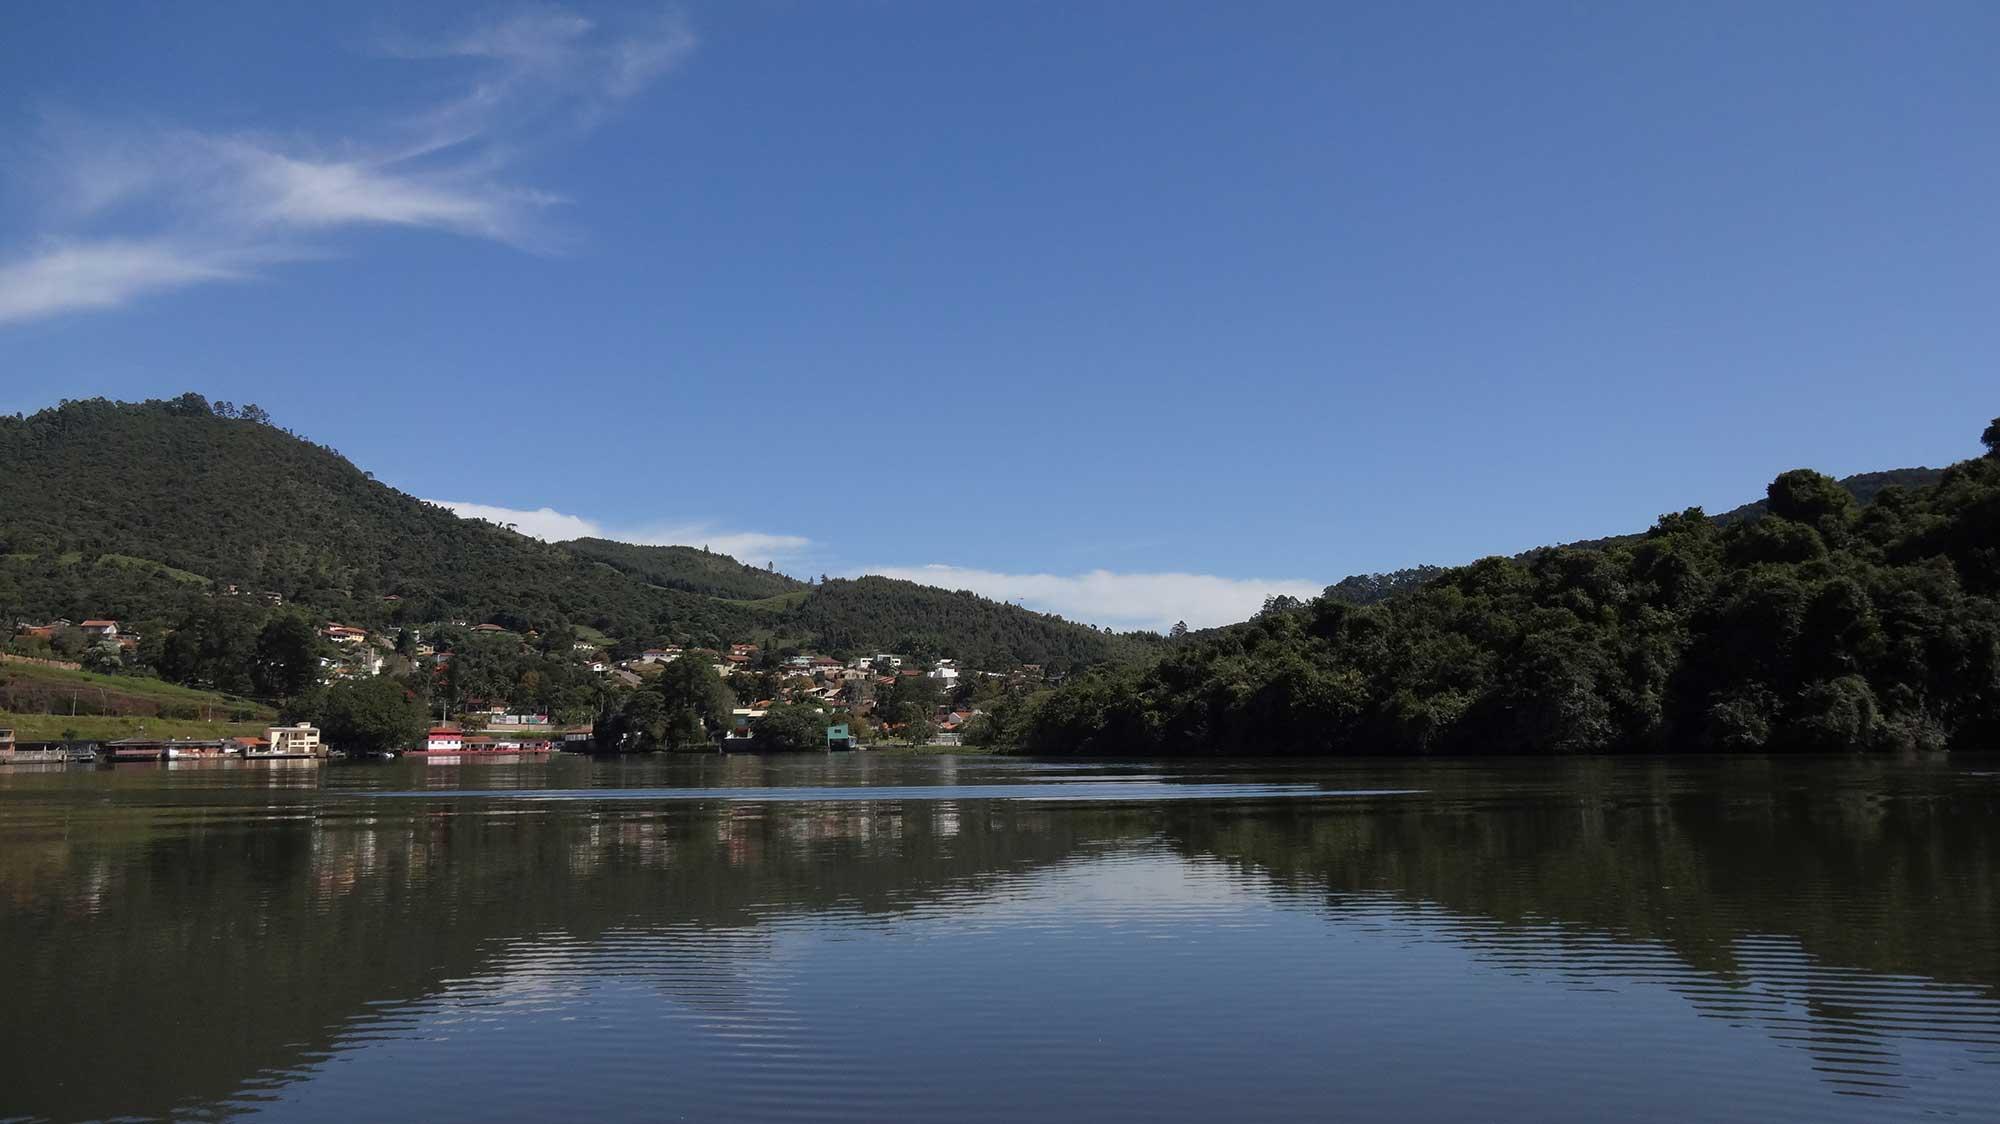 Represa Bortolan - Passeio de Escuna